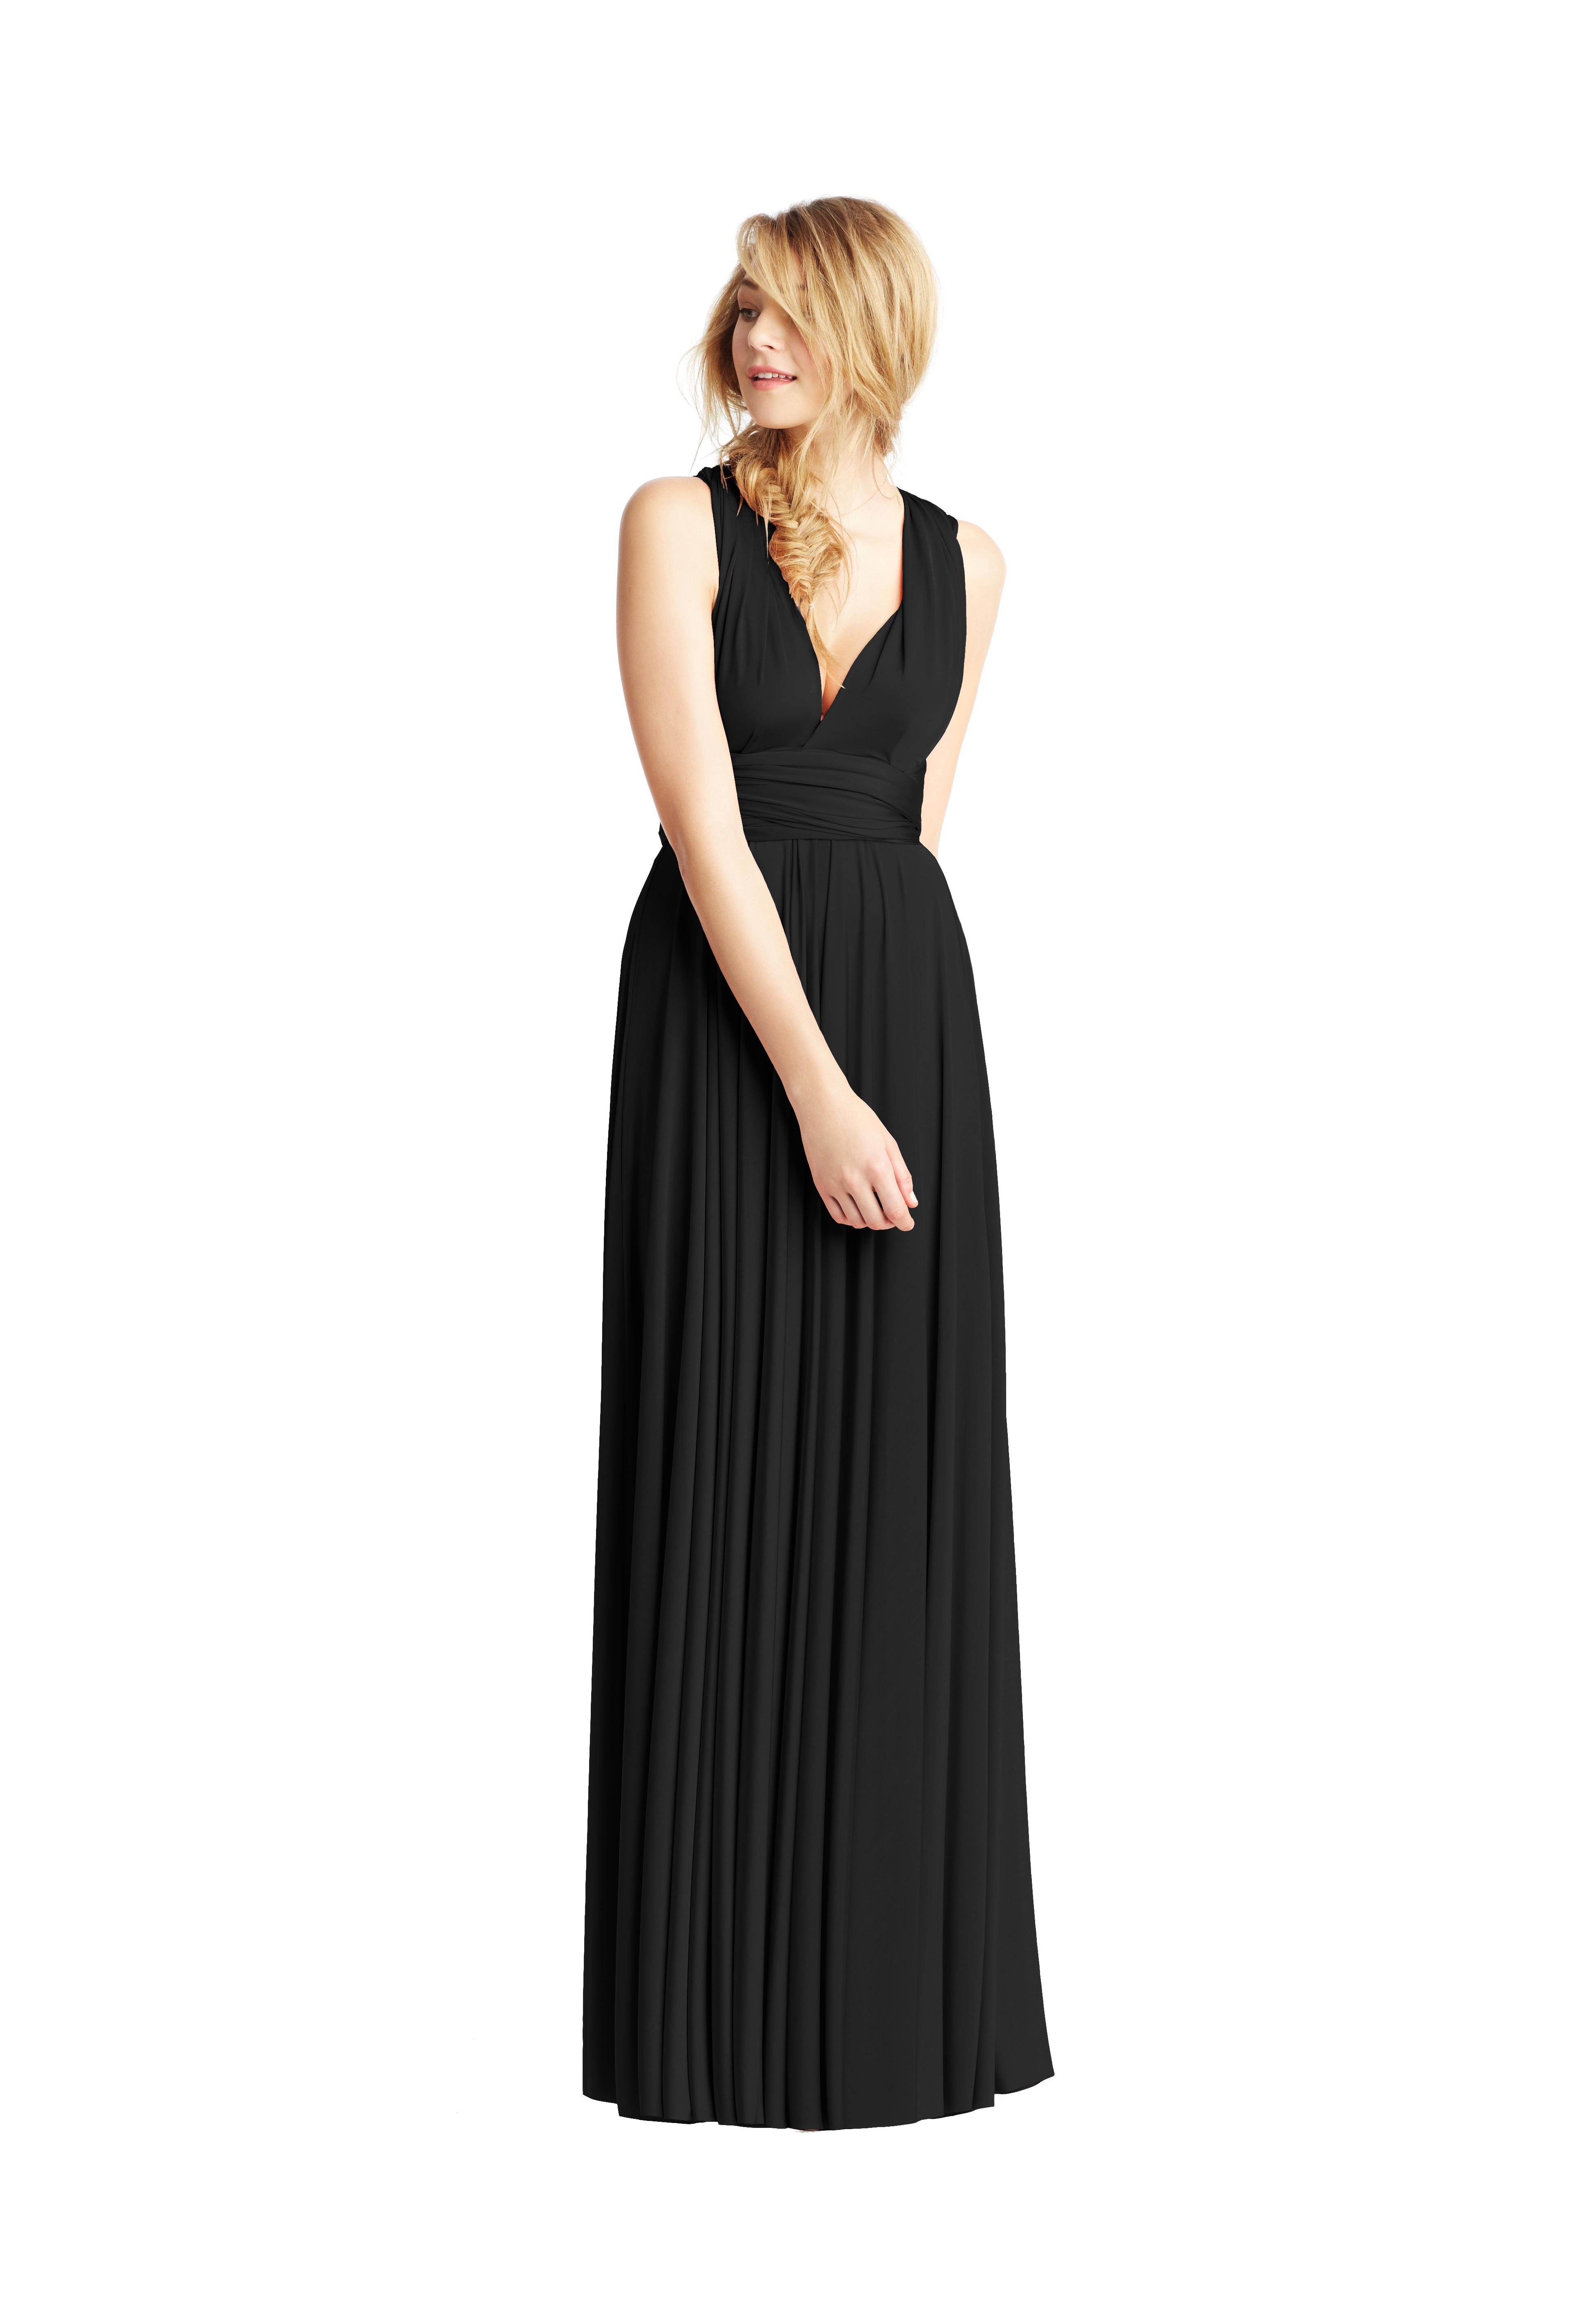 Black Classic Ballgown